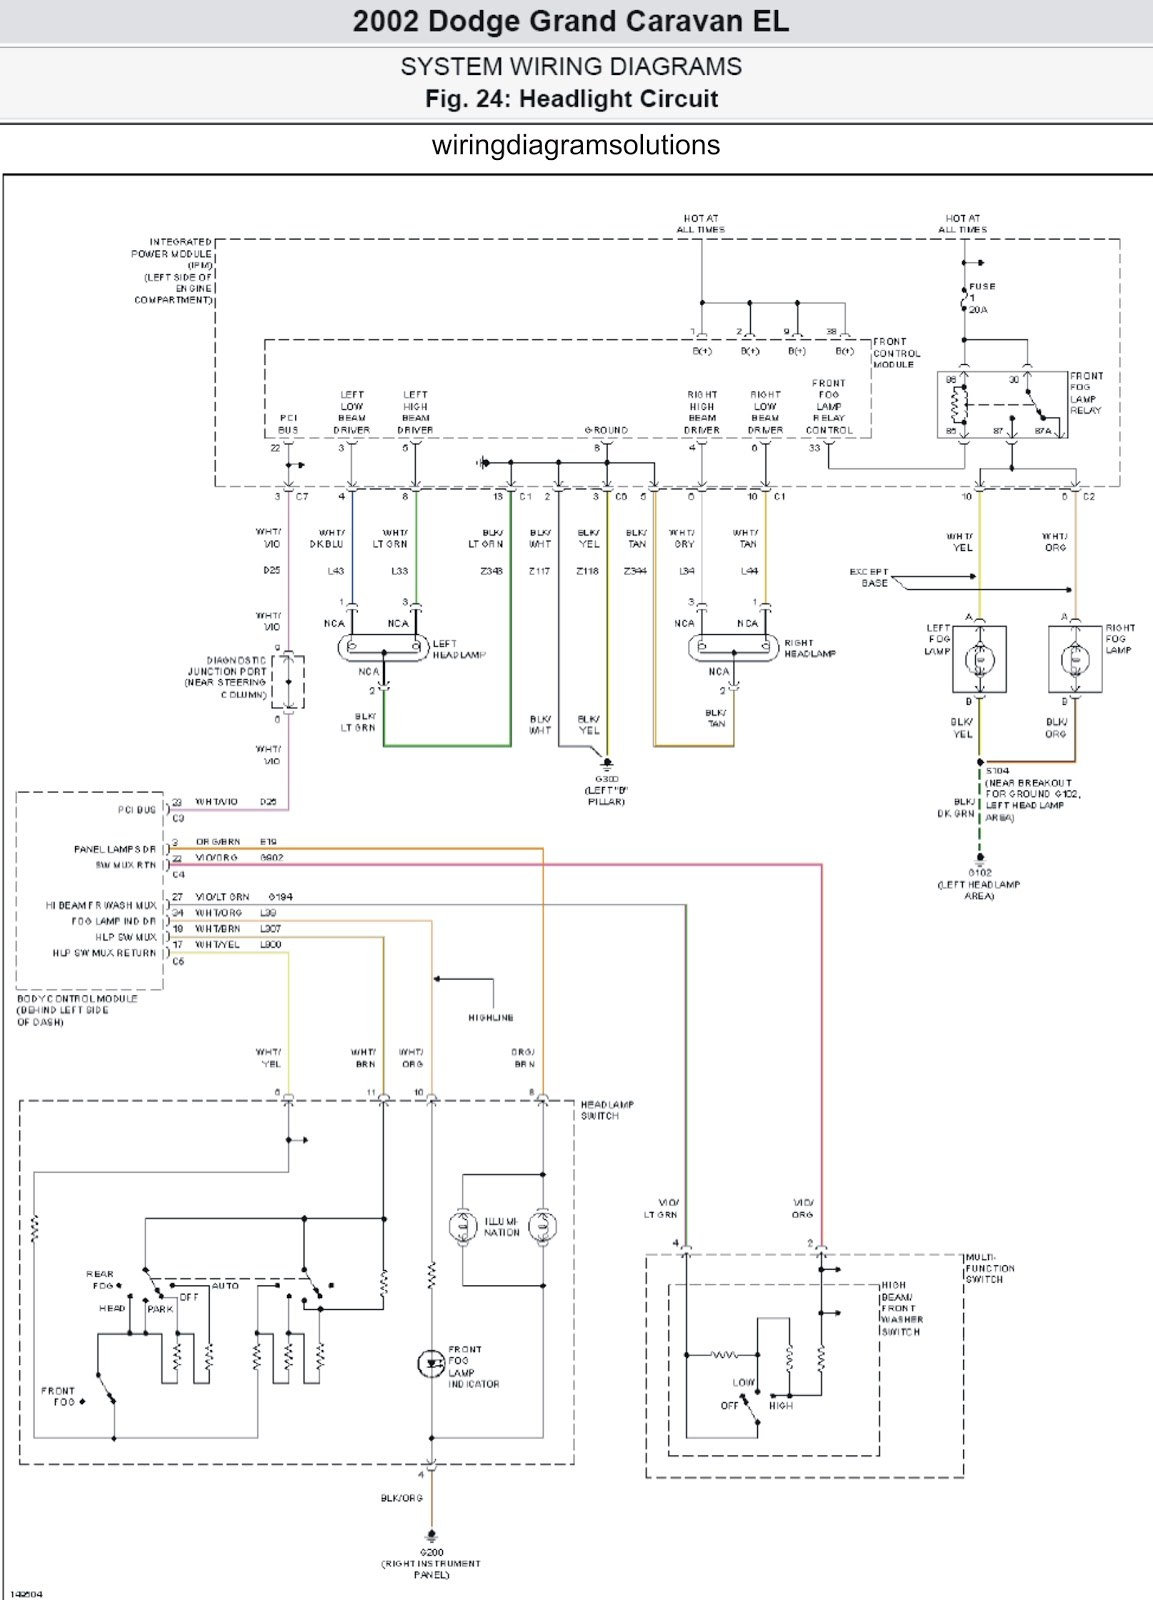 hight resolution of 2002 dodge grand caravan el system wiring diagrams 94 silverado fog light wiring diagram 4 pin